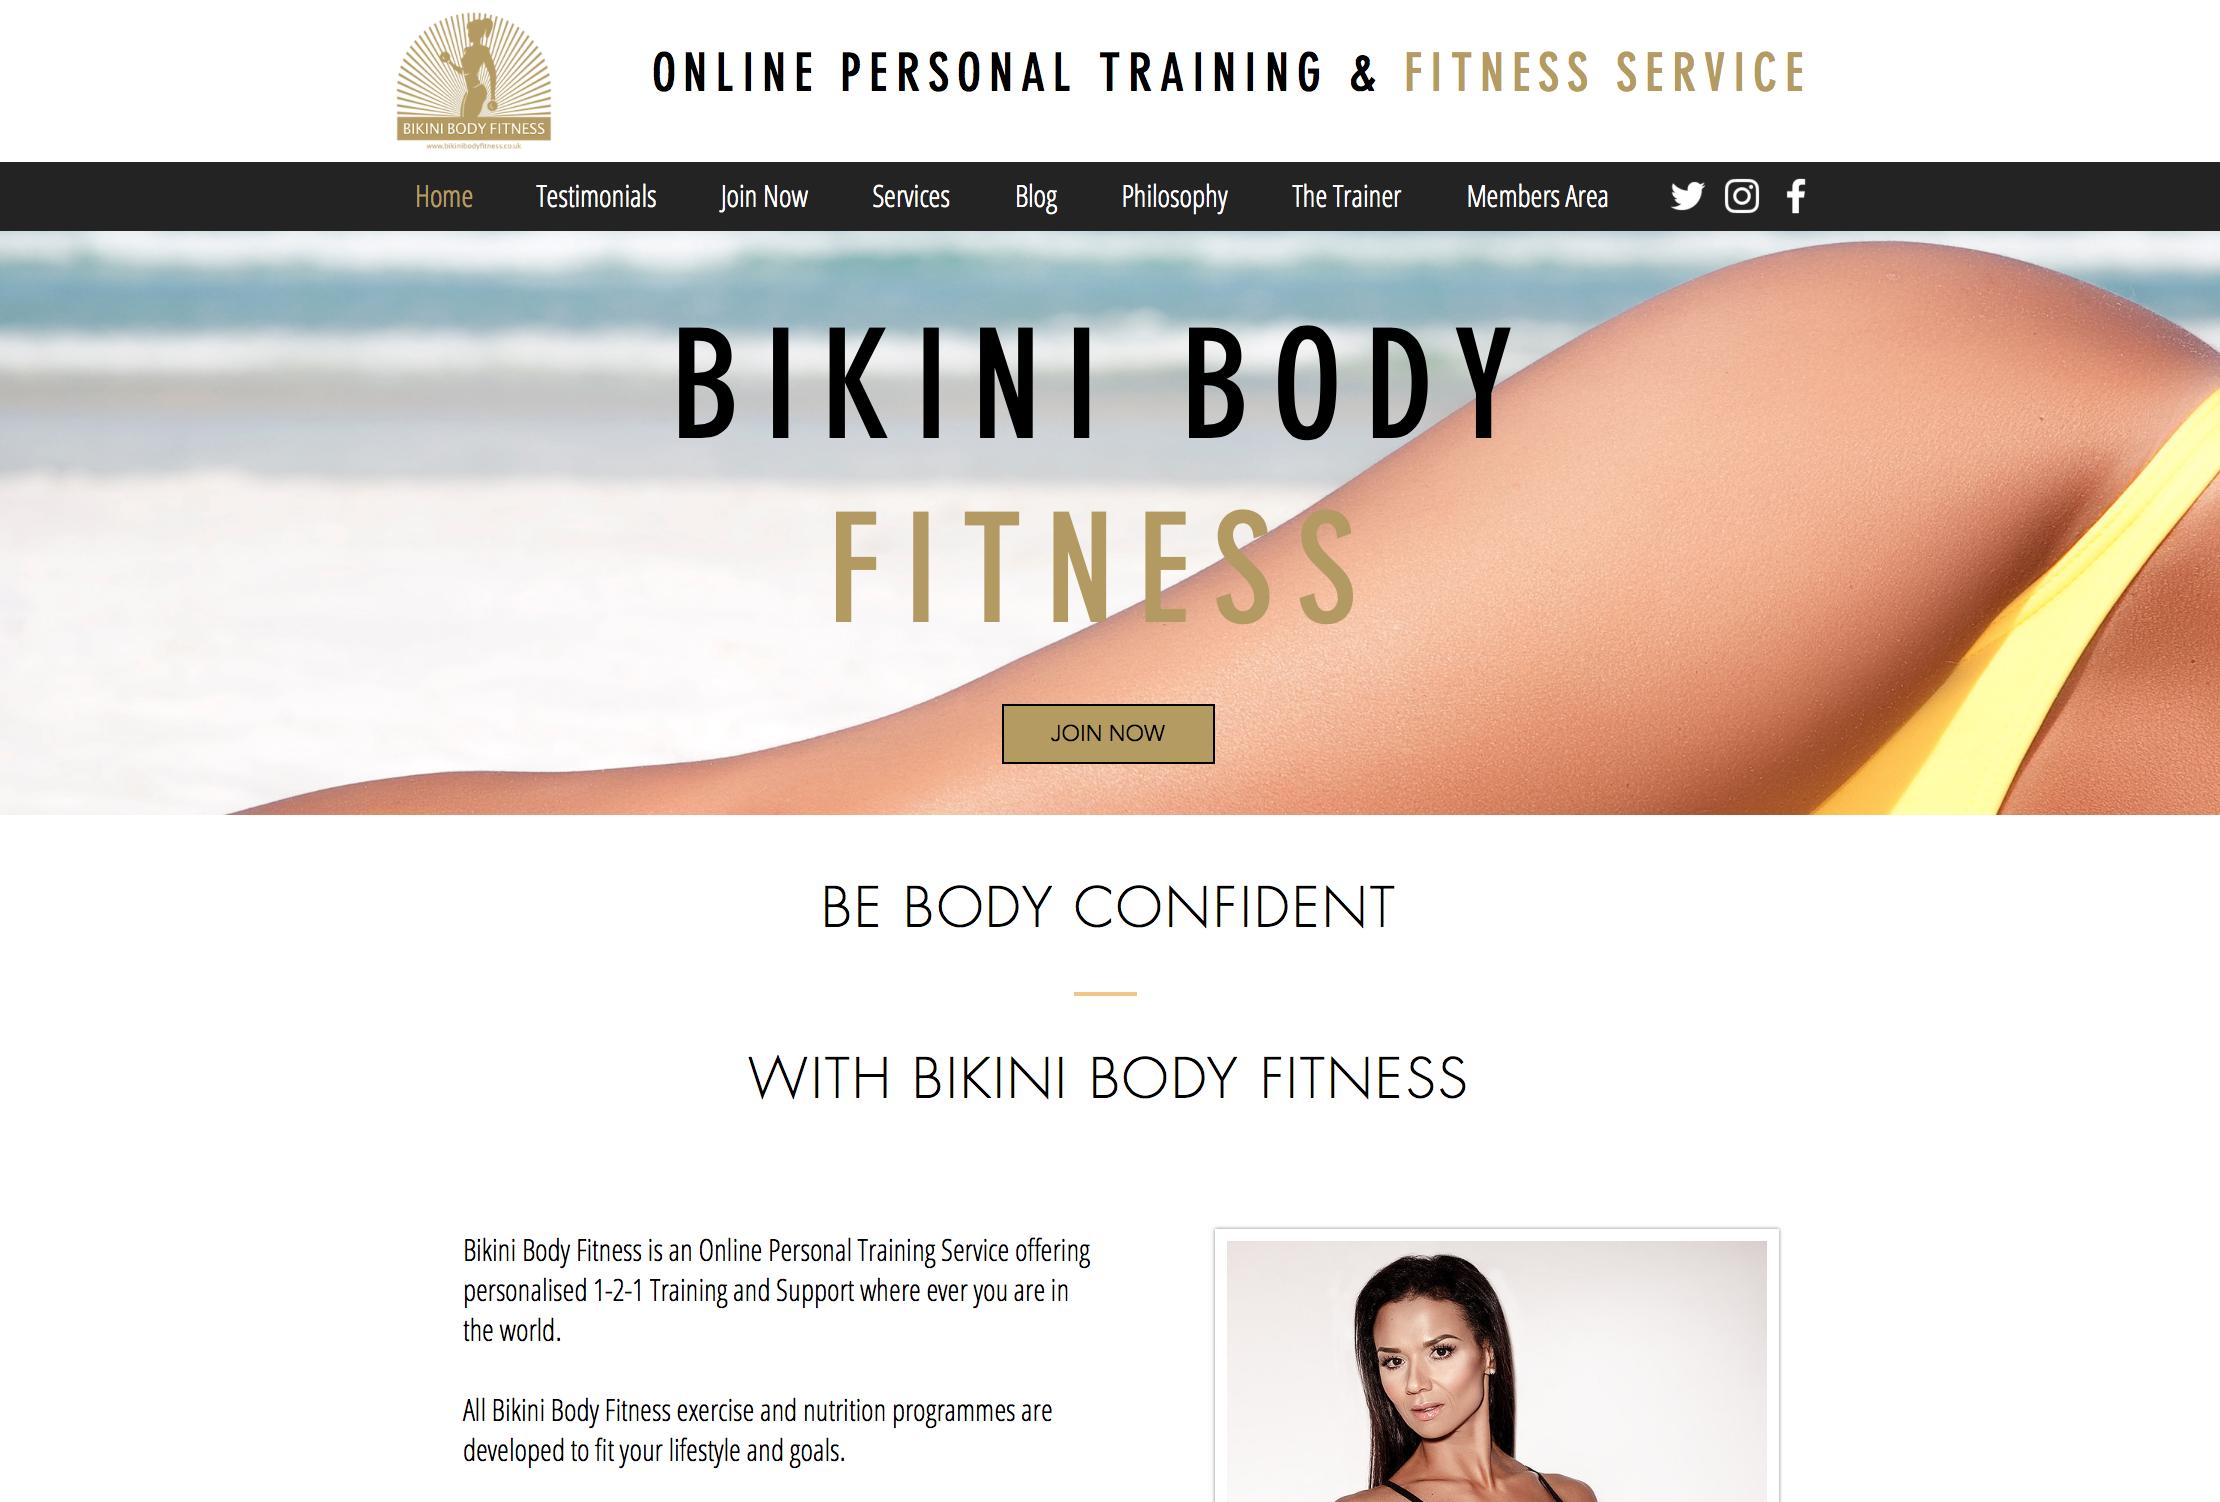 Bikini Body Fitness Website